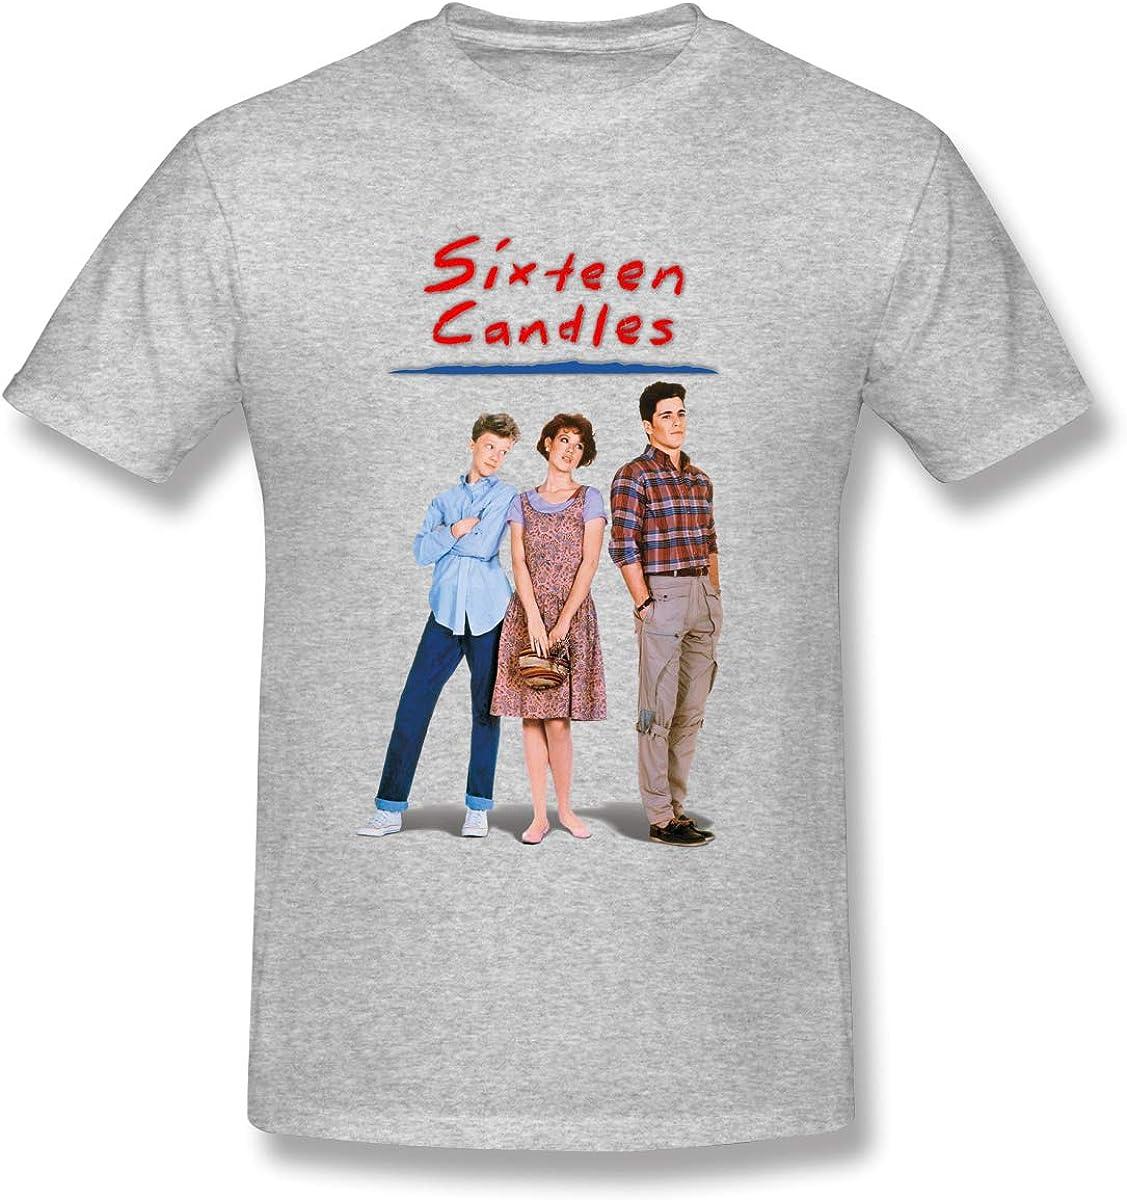 Amazon Com Donaldjchisholm Men S Short Sleeve With Men Sixteen Candles Wallpaper T Shirts Gray Clothing